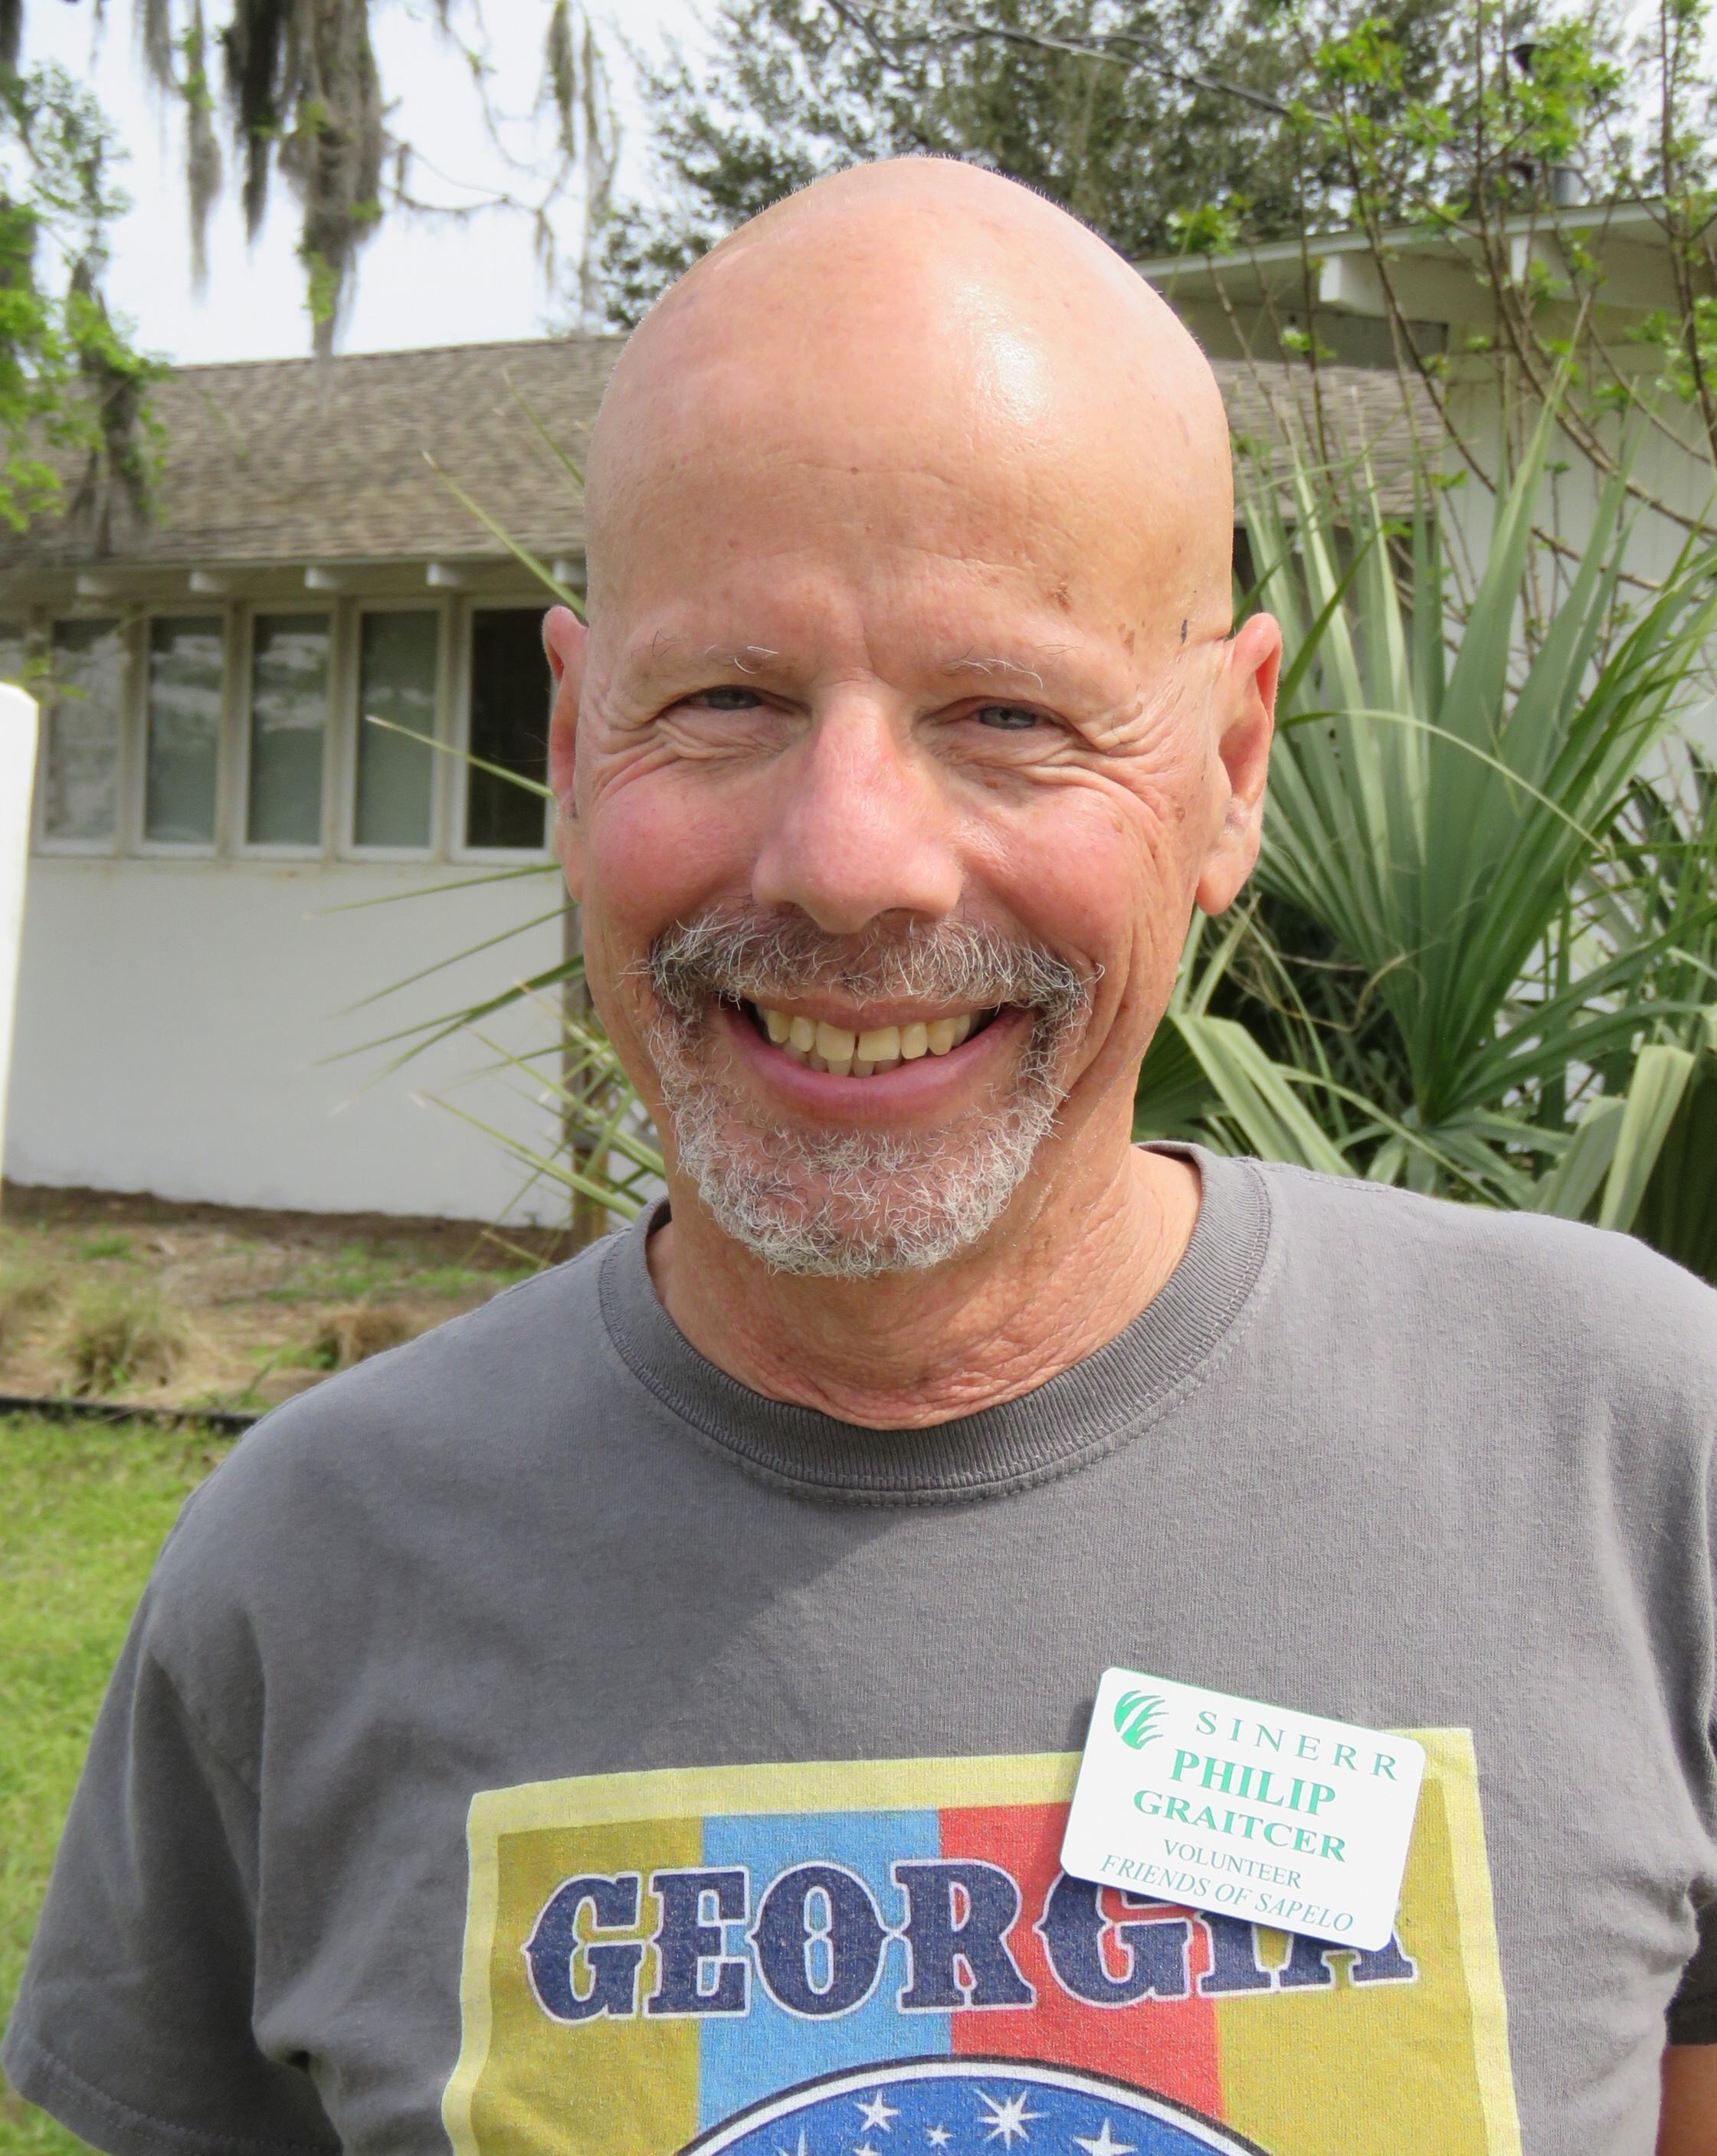 Member-at-Large - Philip Graitcer